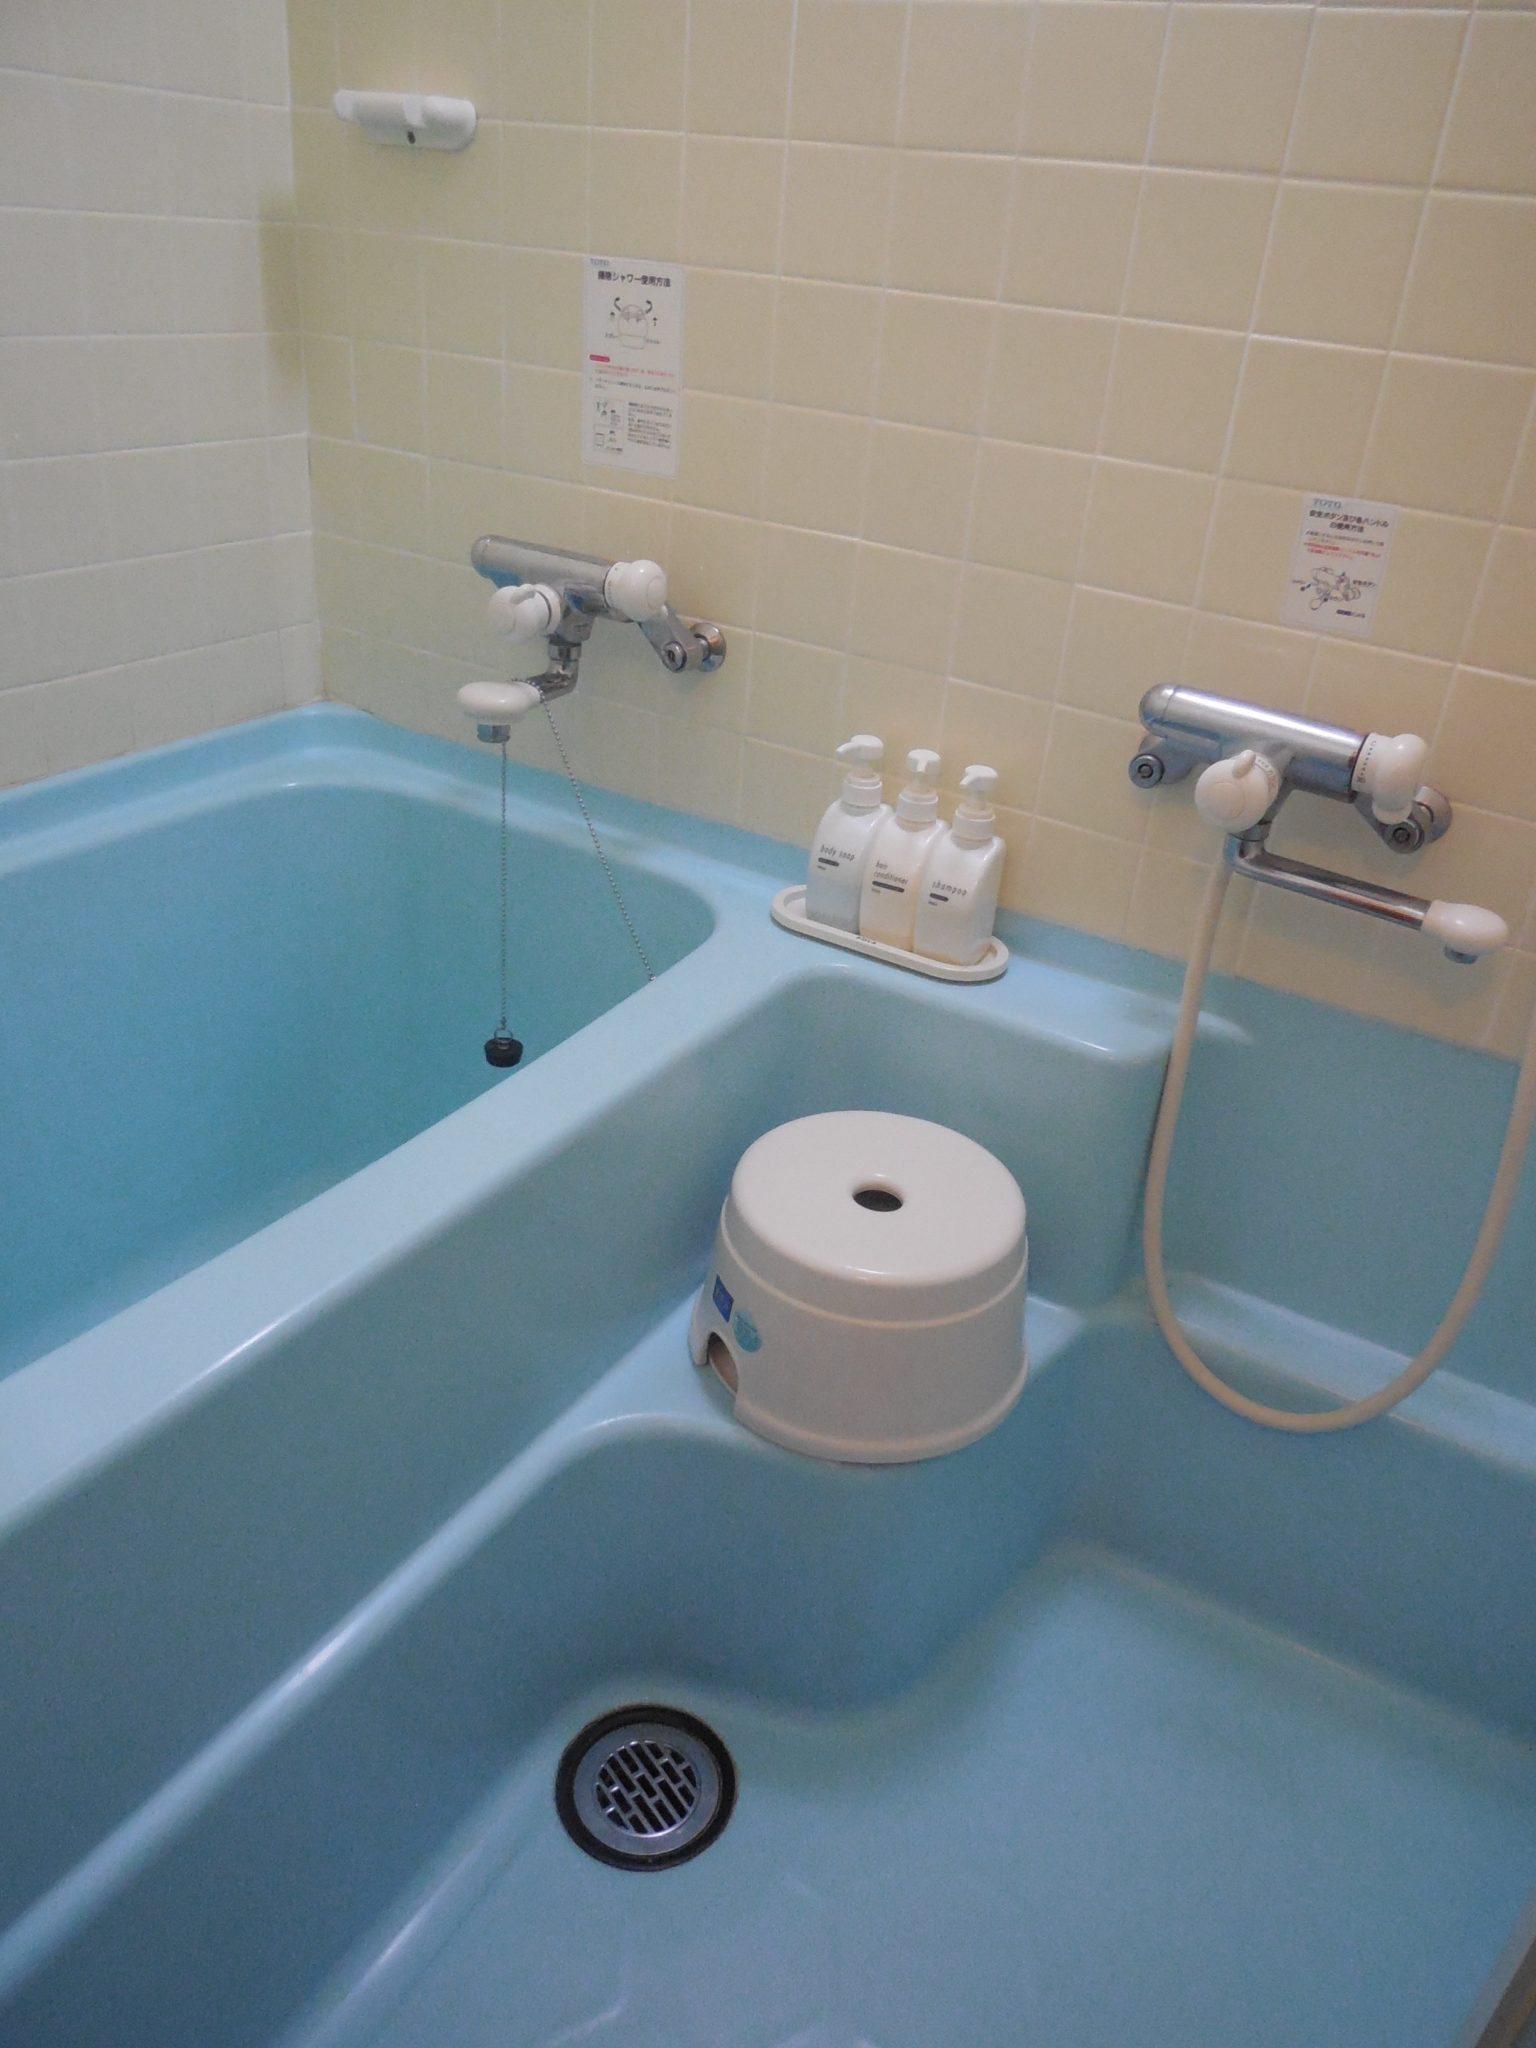 Outstanding Steeping Tub Ensign - Bathtub Ideas - dilata.info